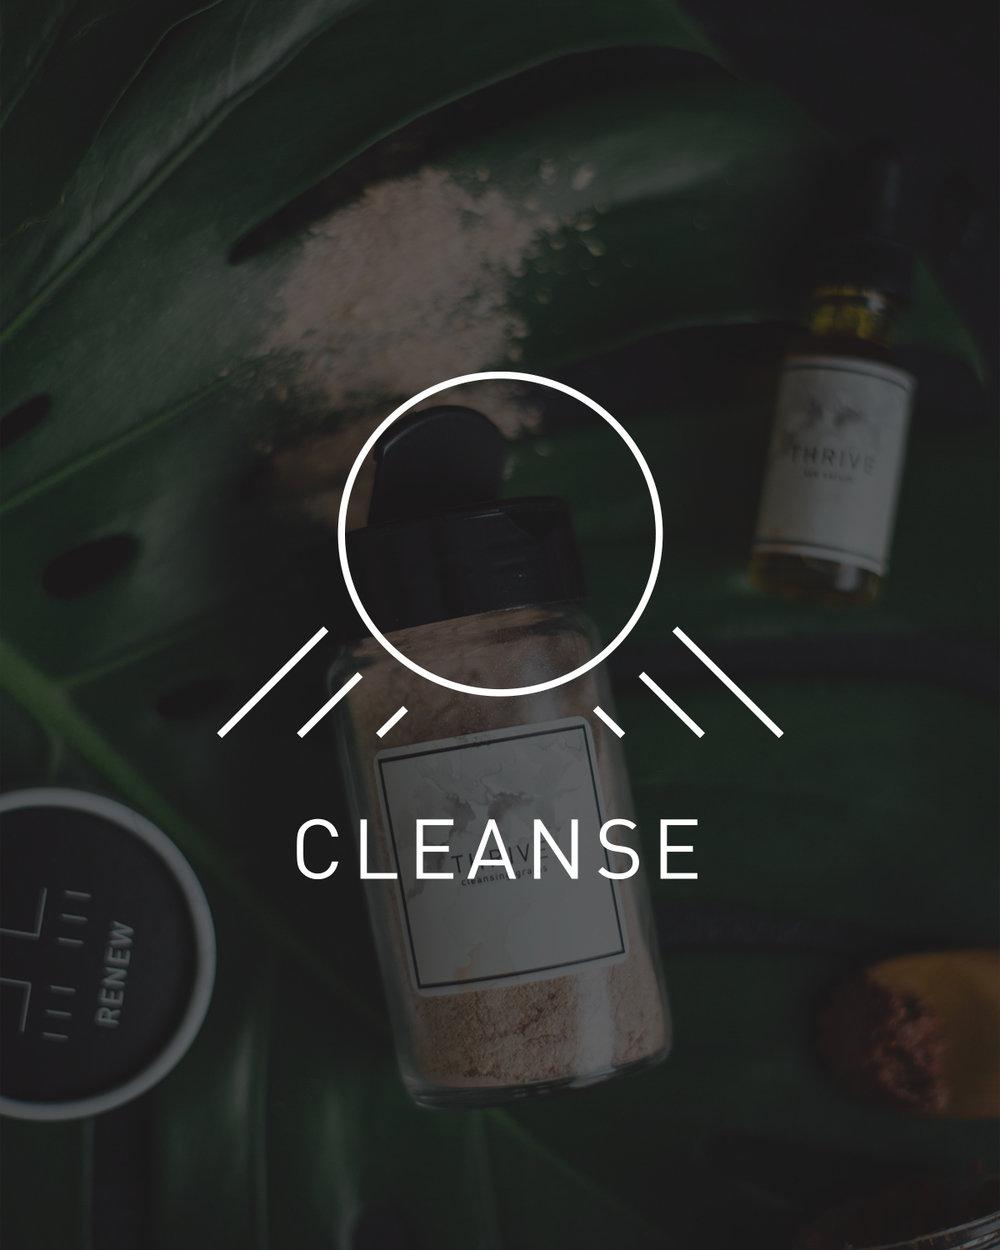 Cleanse.jpg